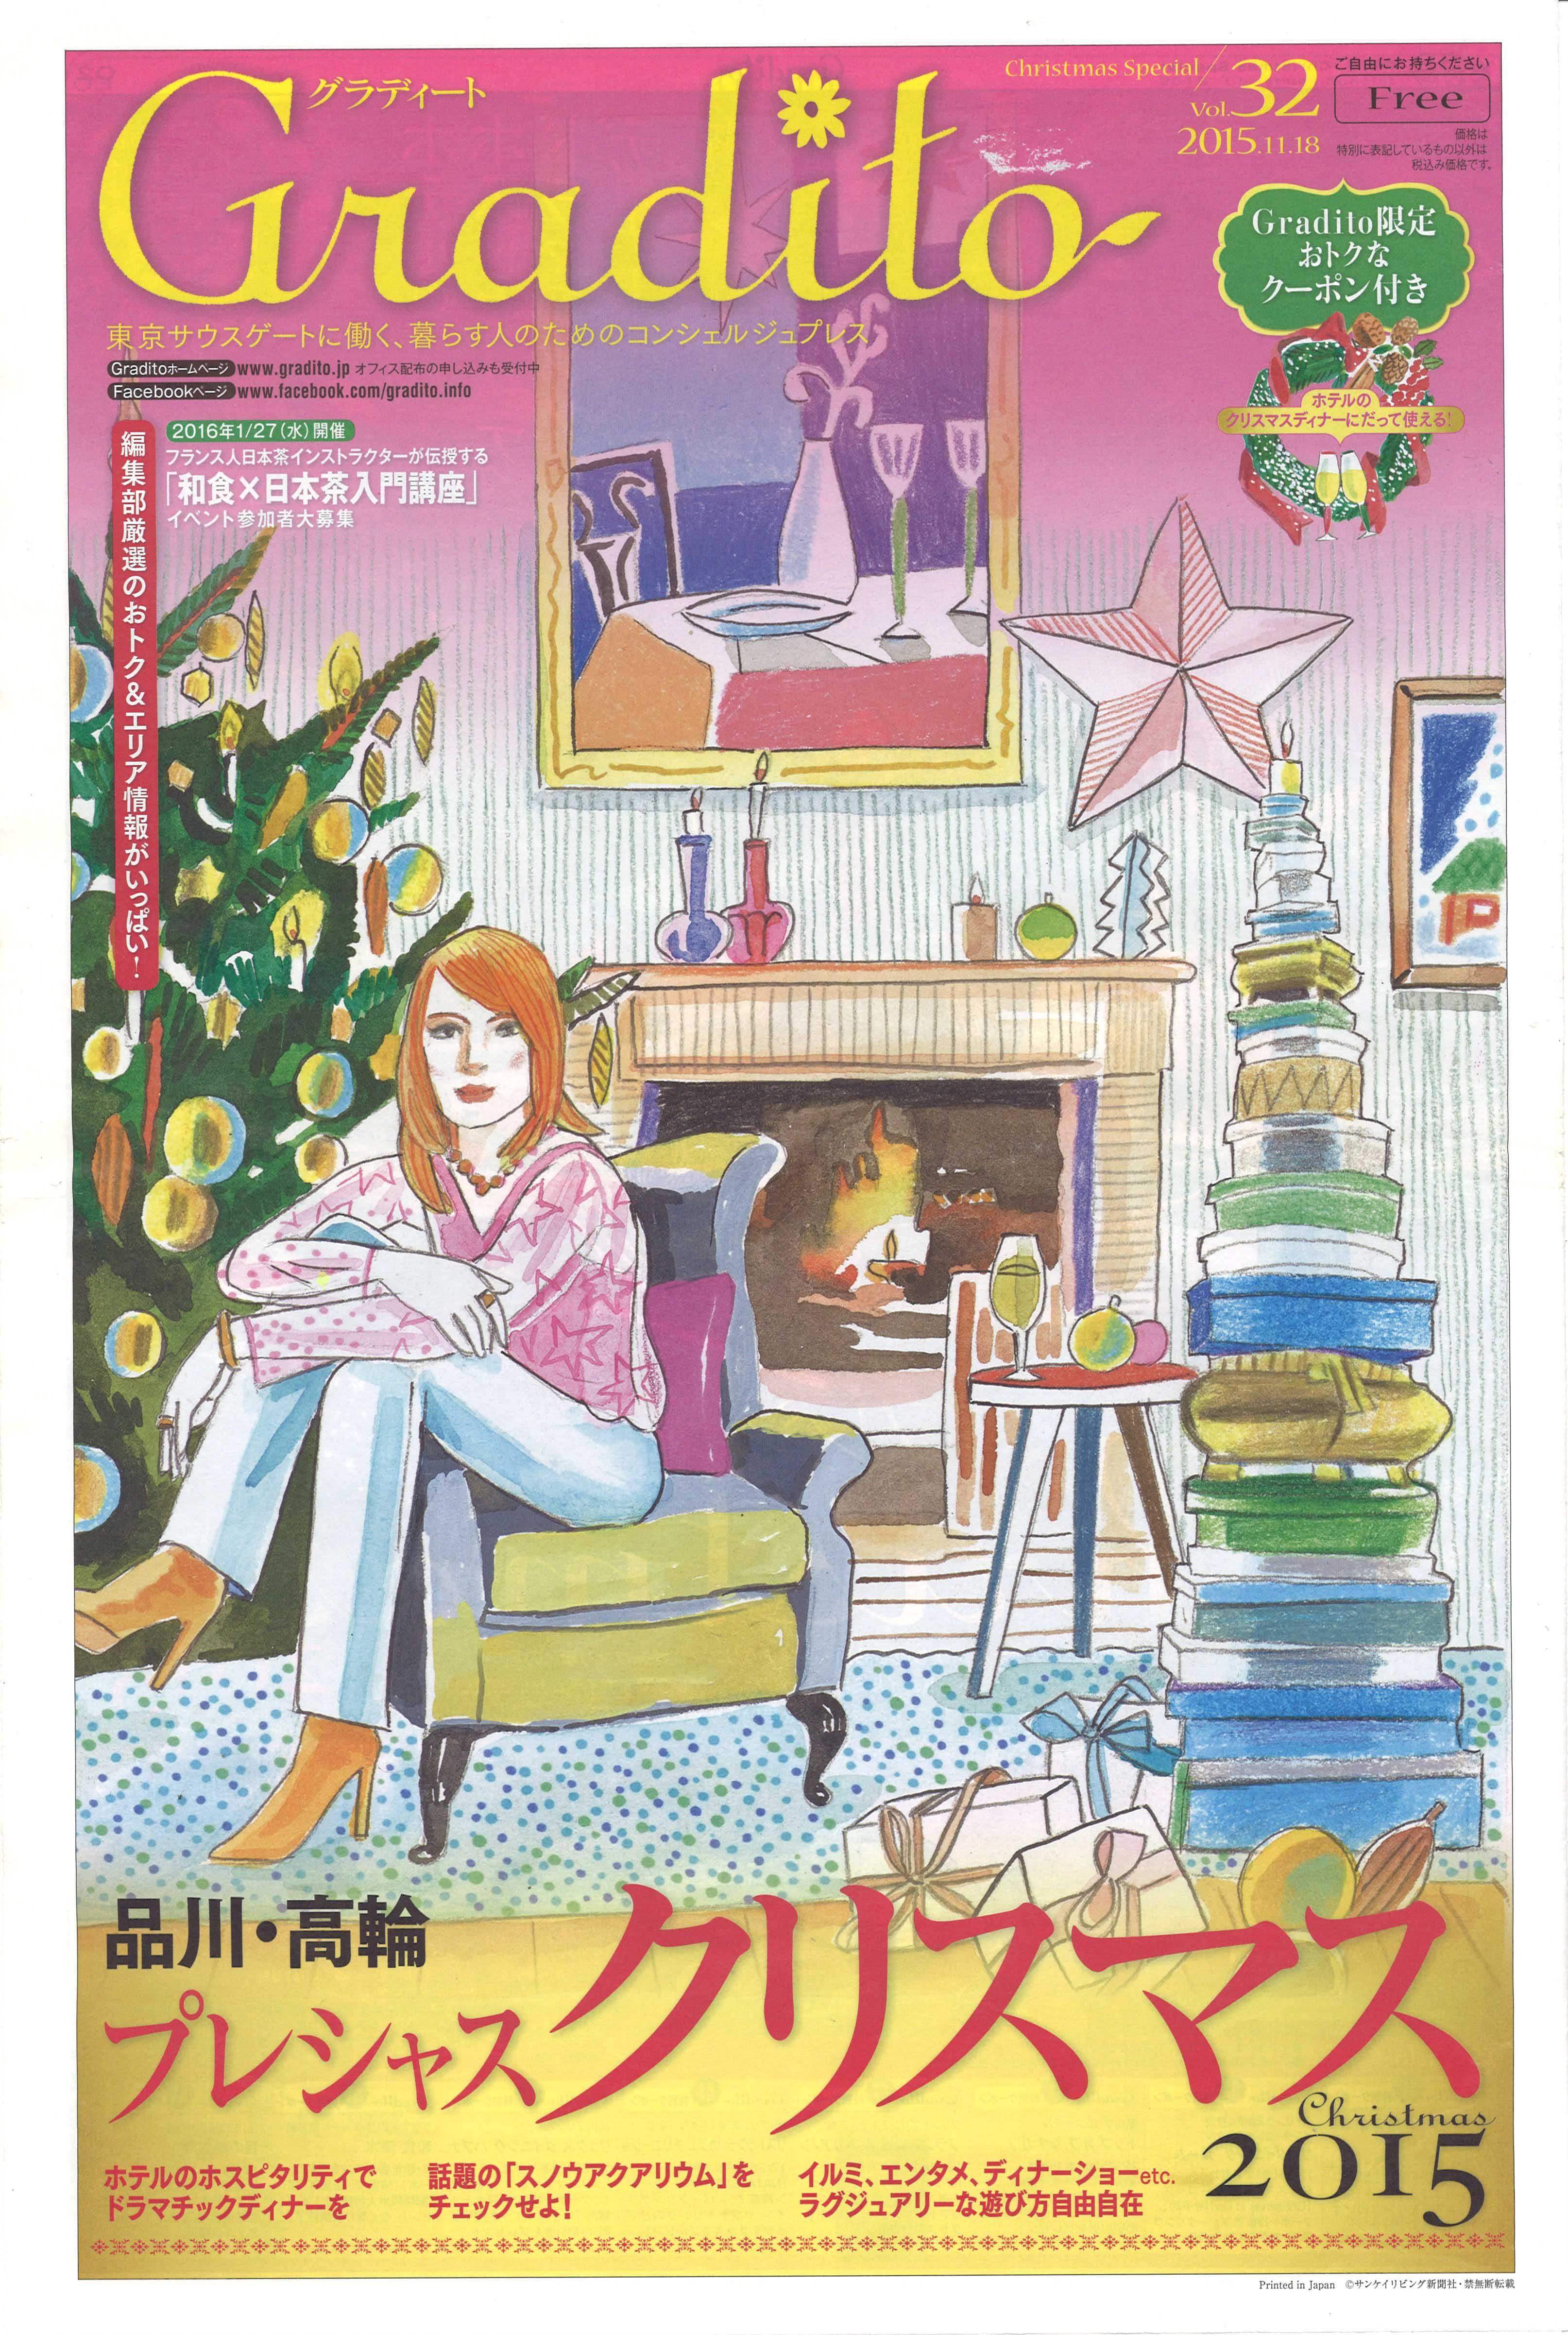 「Gradito」2015 Christmas Special Vol.32